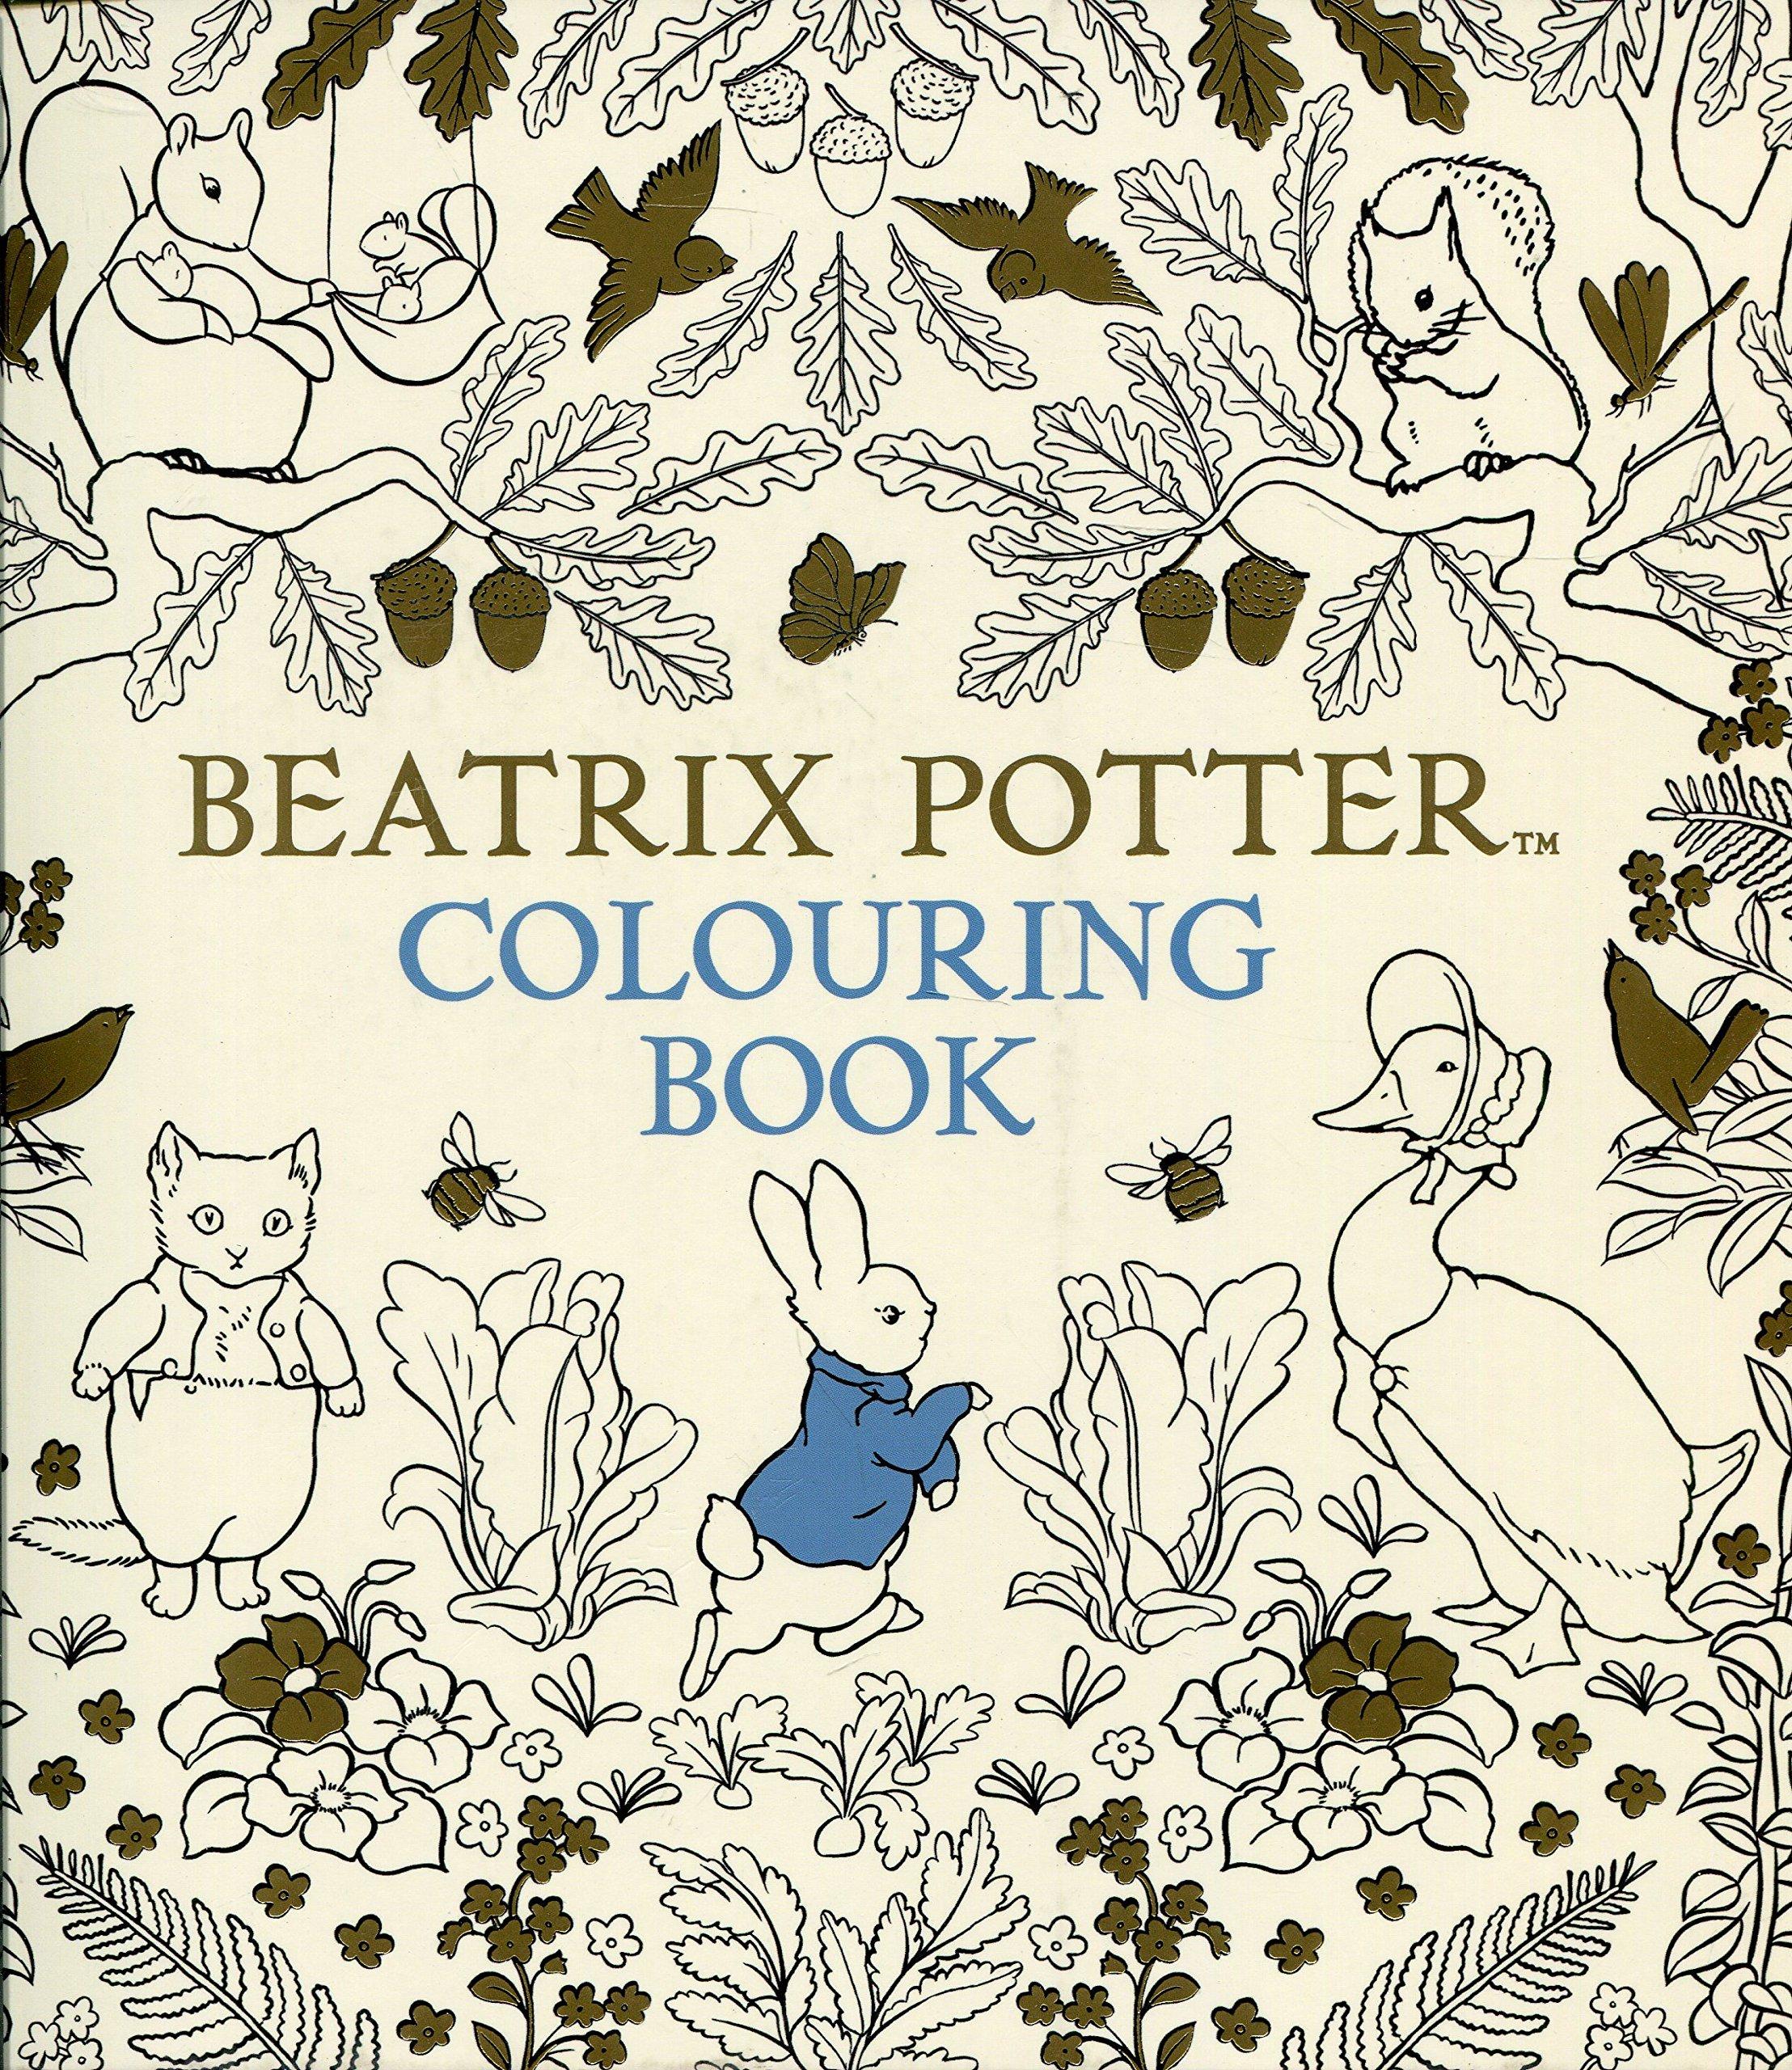 - The Beatrix Potter Colouring Book: Amazon.de: Potter, Beatrix